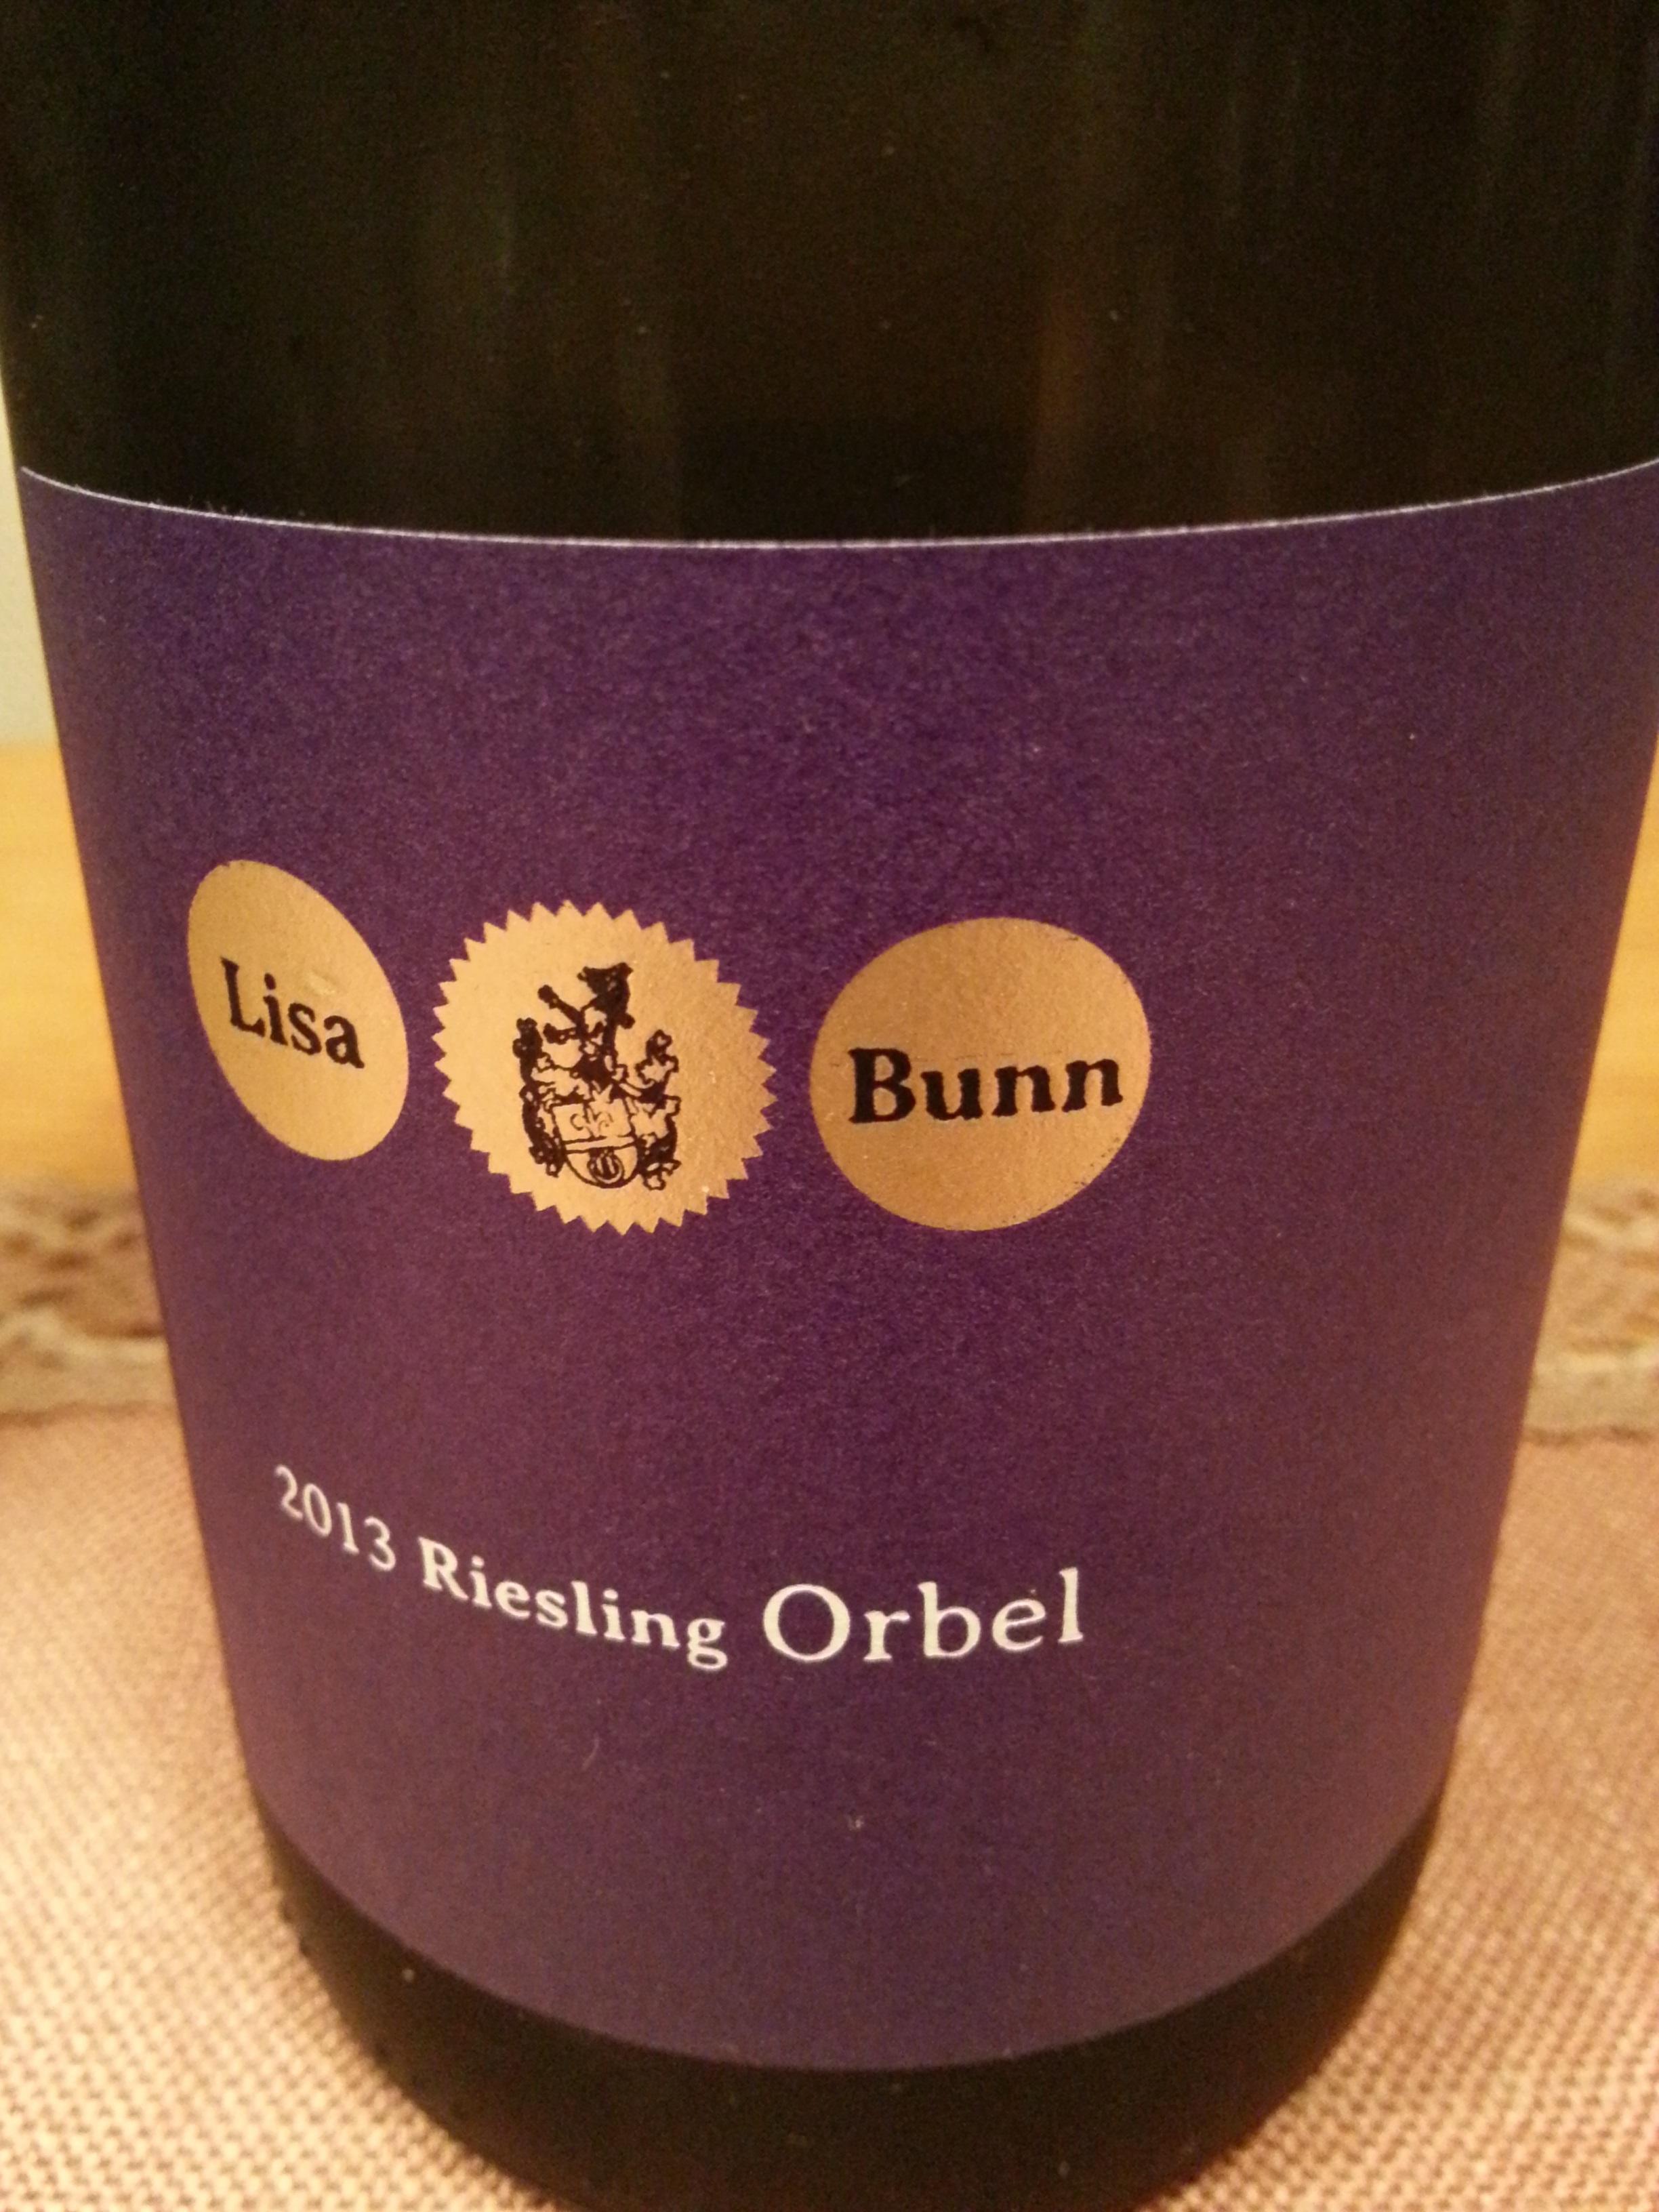 2013 Riesling Orbel | Lisa Bunn